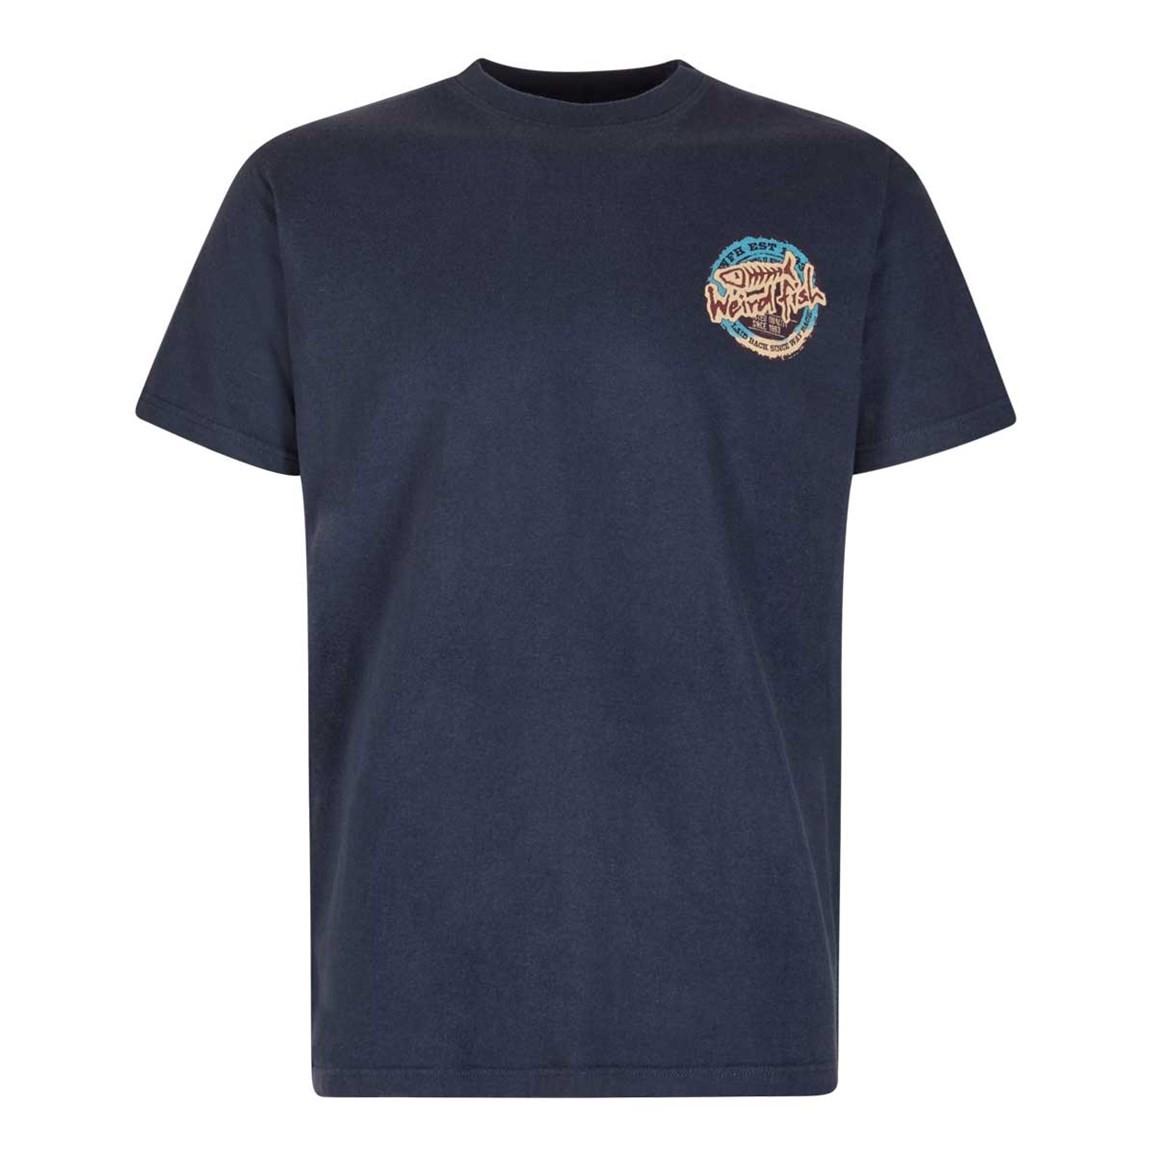 Haggerstan Graphic Print T Shirt Dark Navy